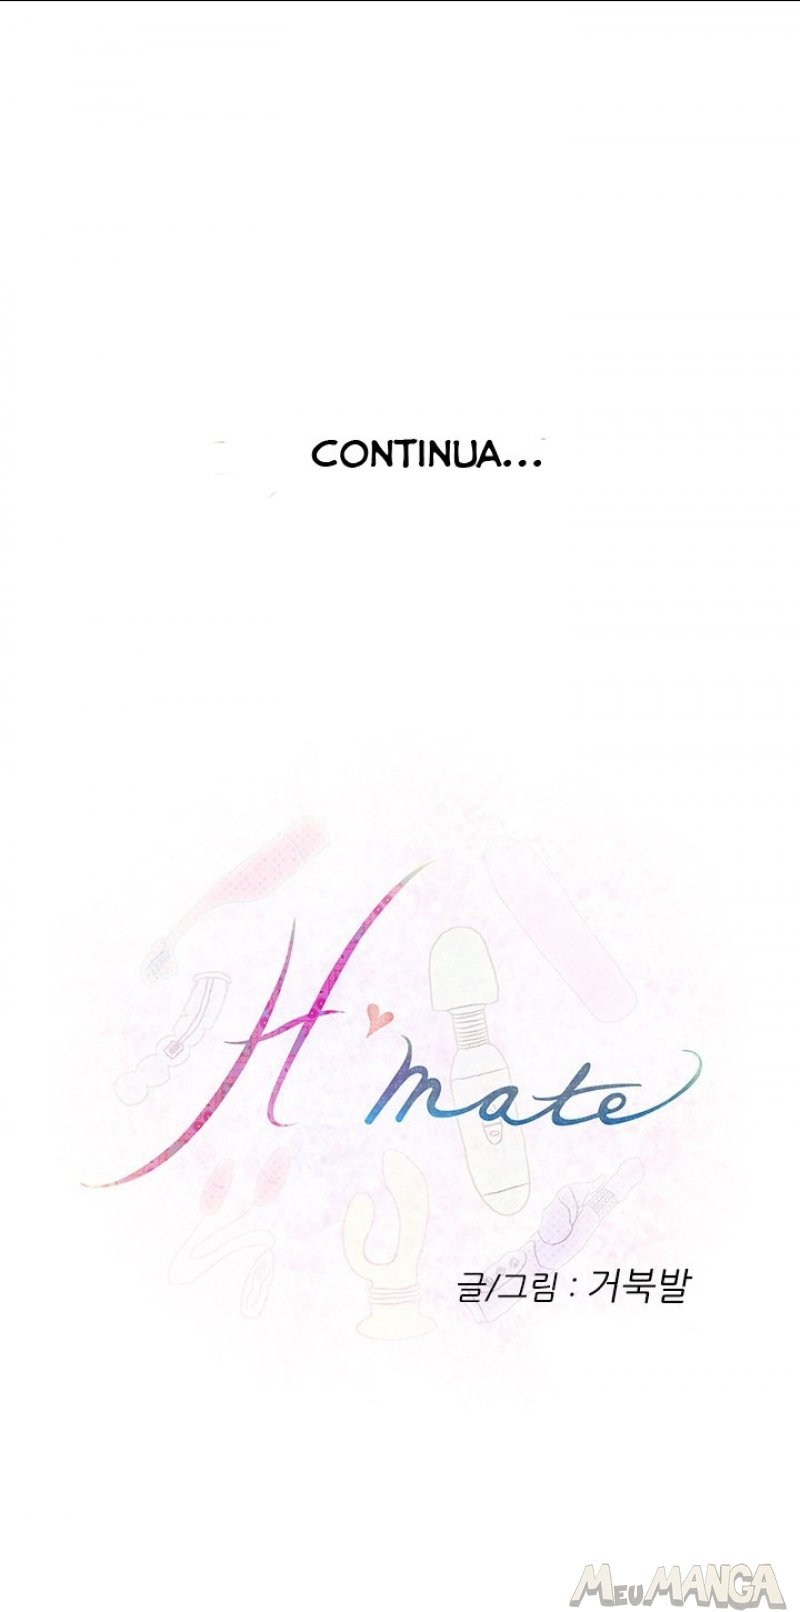 H MATE VOL. 04 CAP. 28